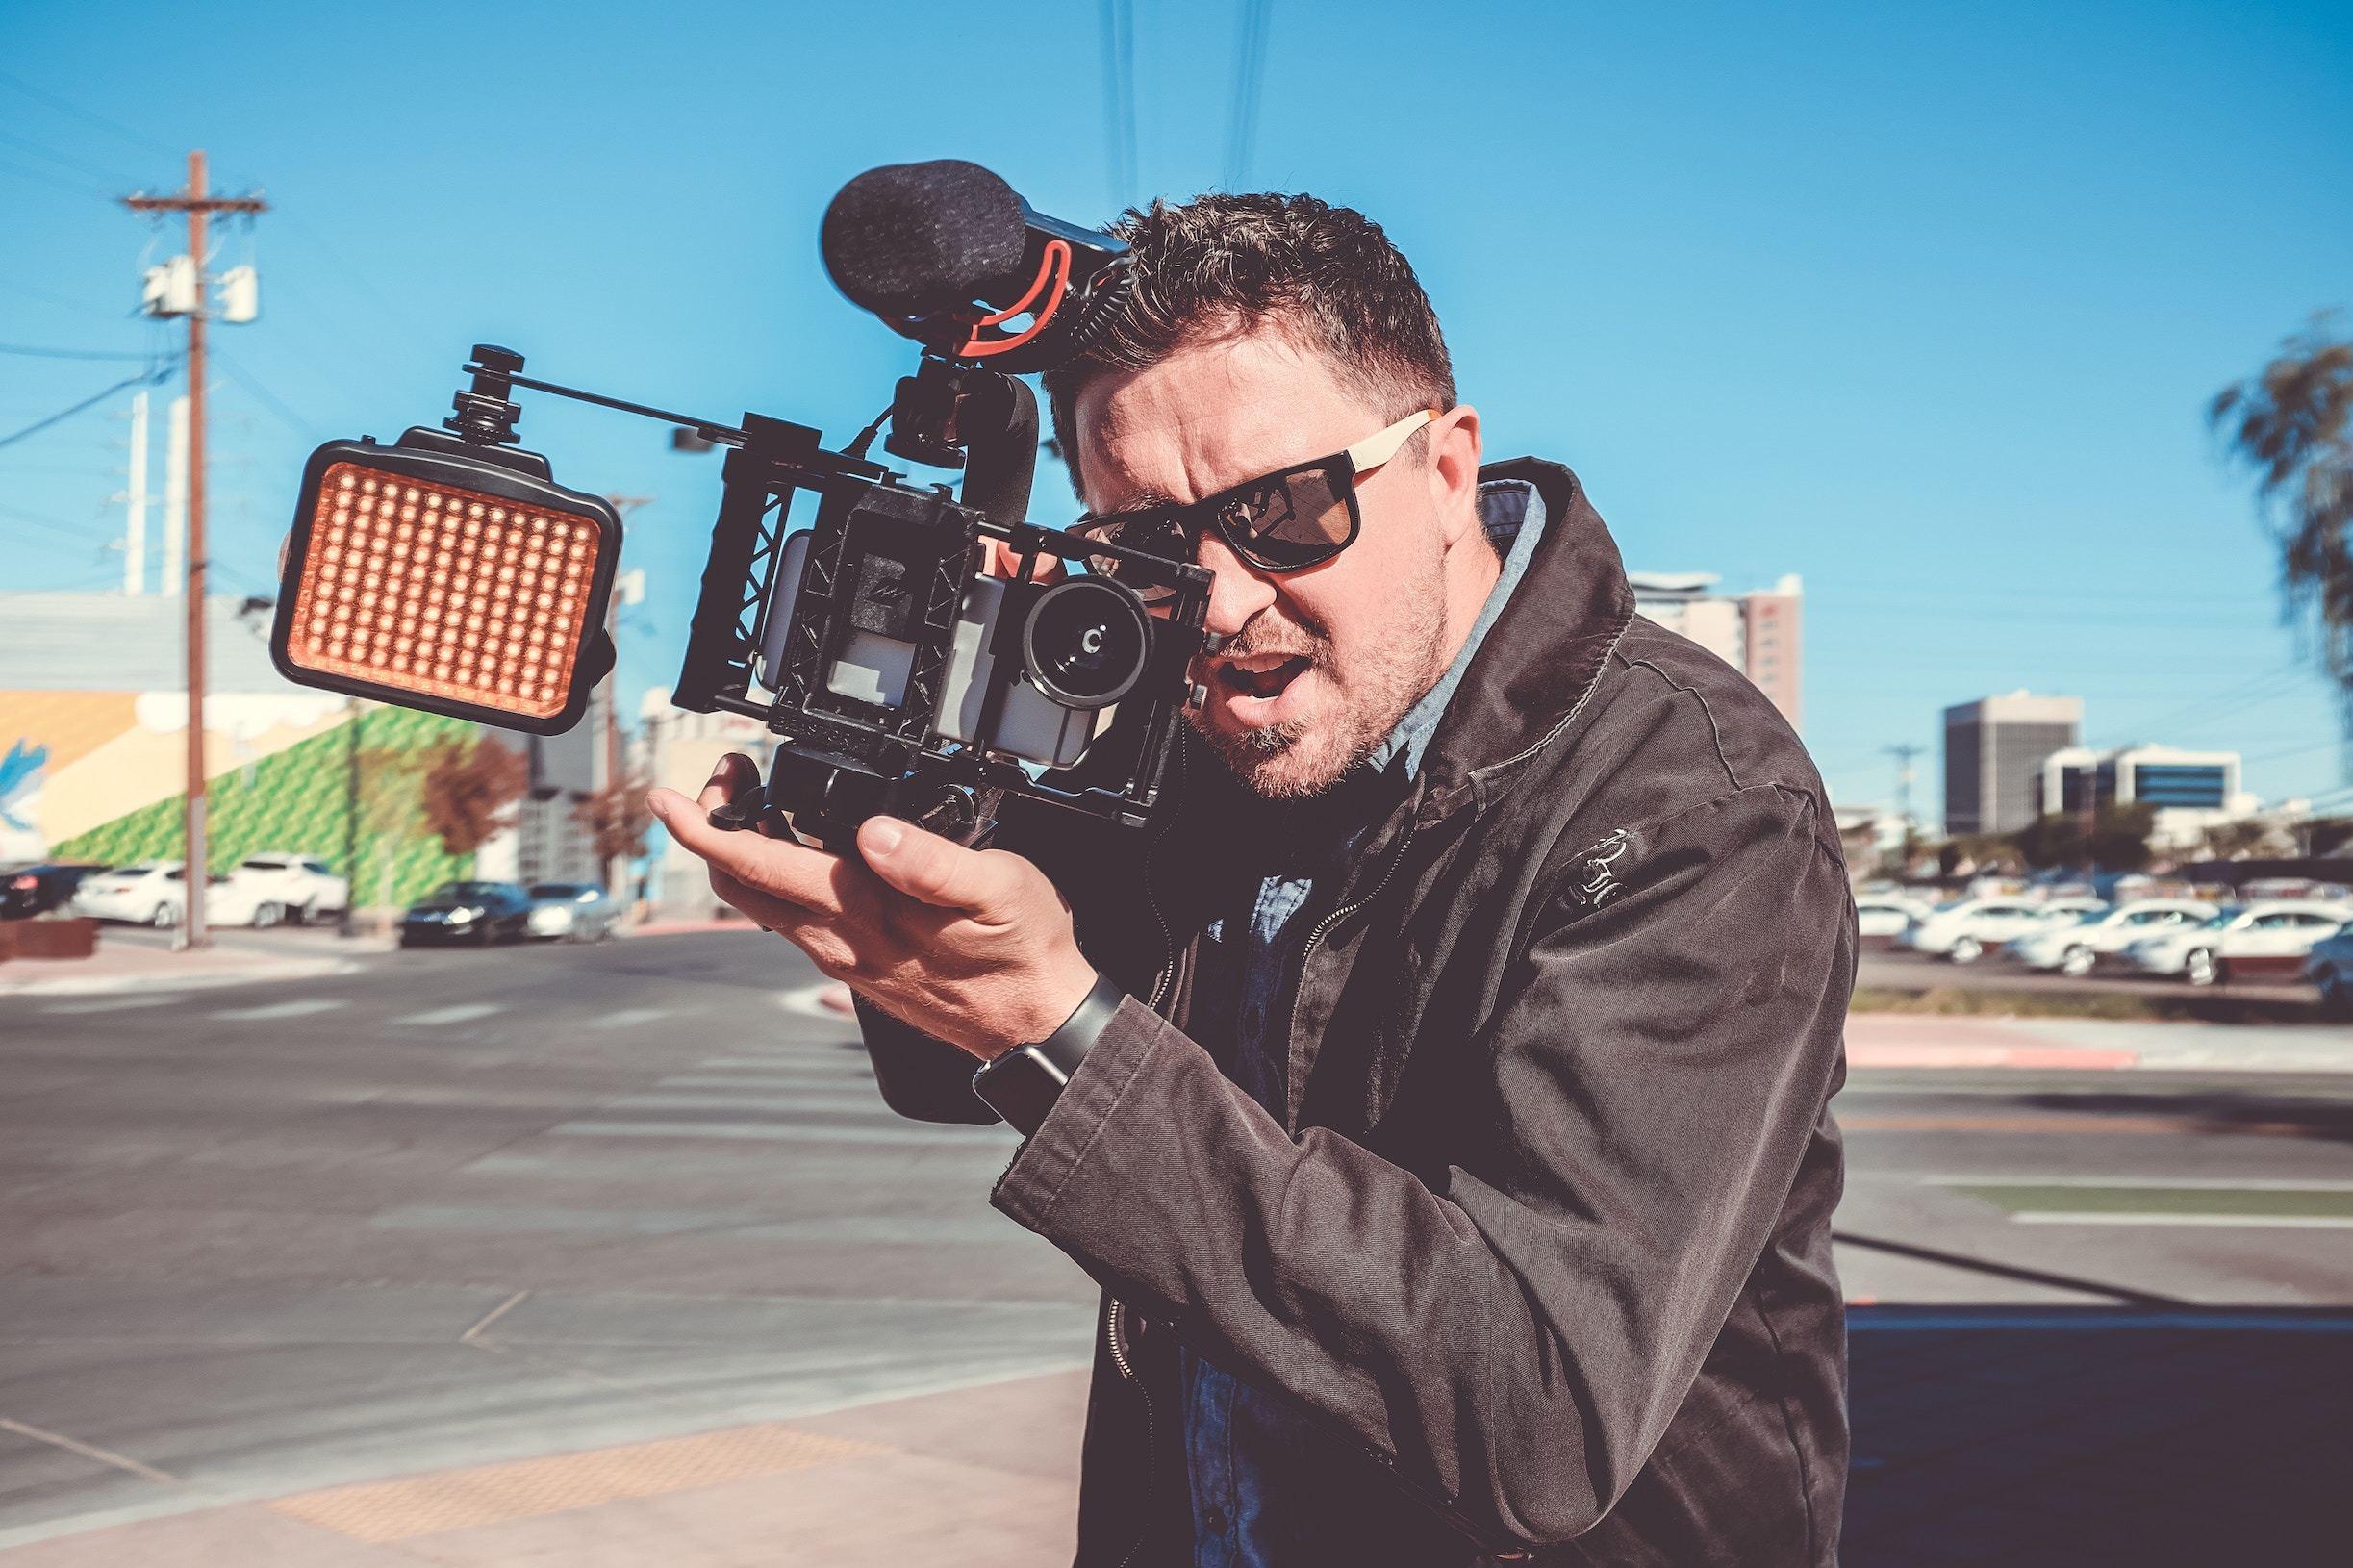 Man with camera looking aggressive